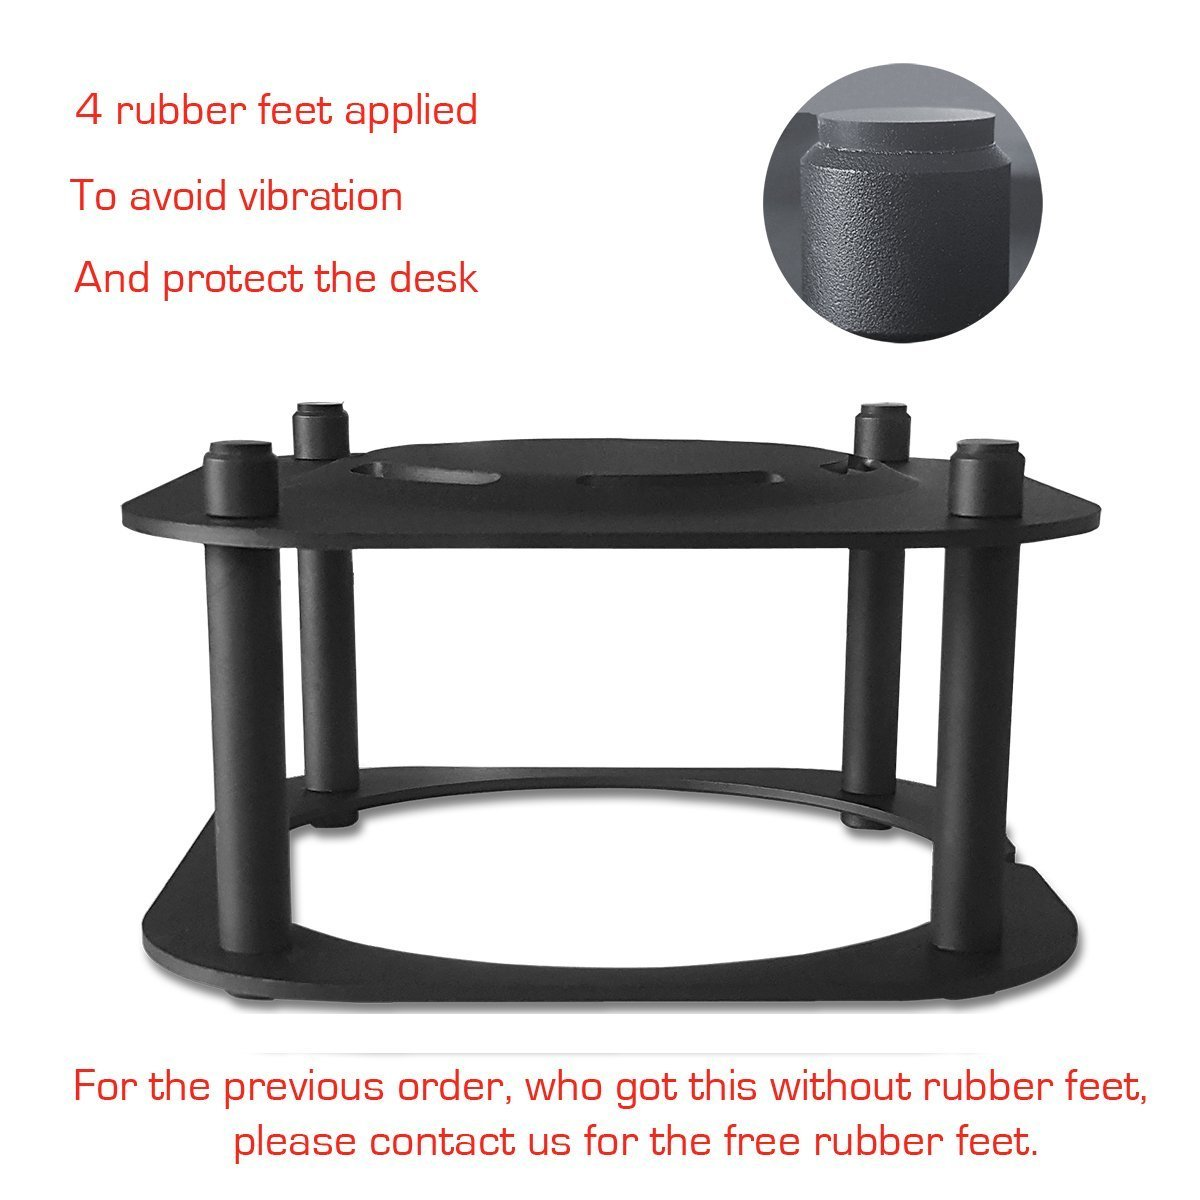 Meres Anti-Rutsch Aluminium Abnehmbare Halterung Desktop Halter Stand f/ür Homepods AI-Lautsprecher